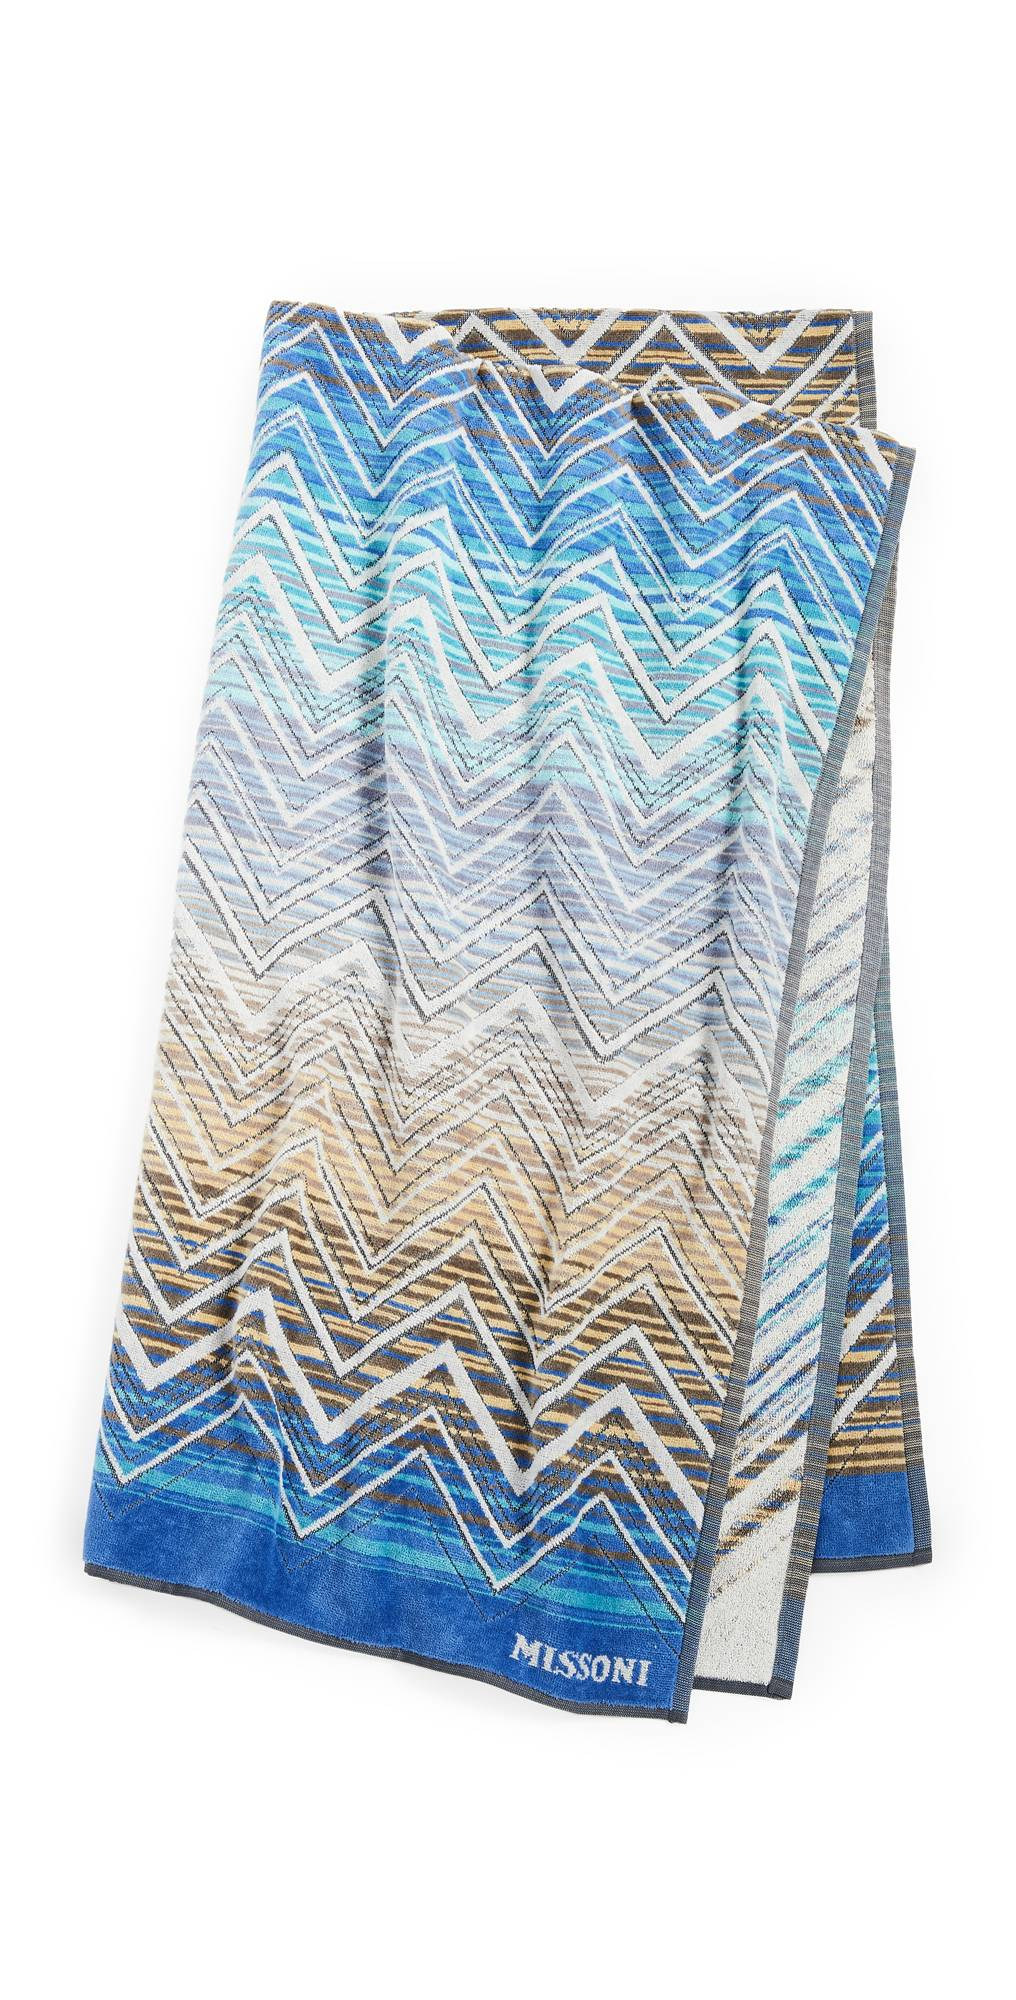 Missoni Home Tolomeo Beach Towel  - Multi Blue - Size: One Size